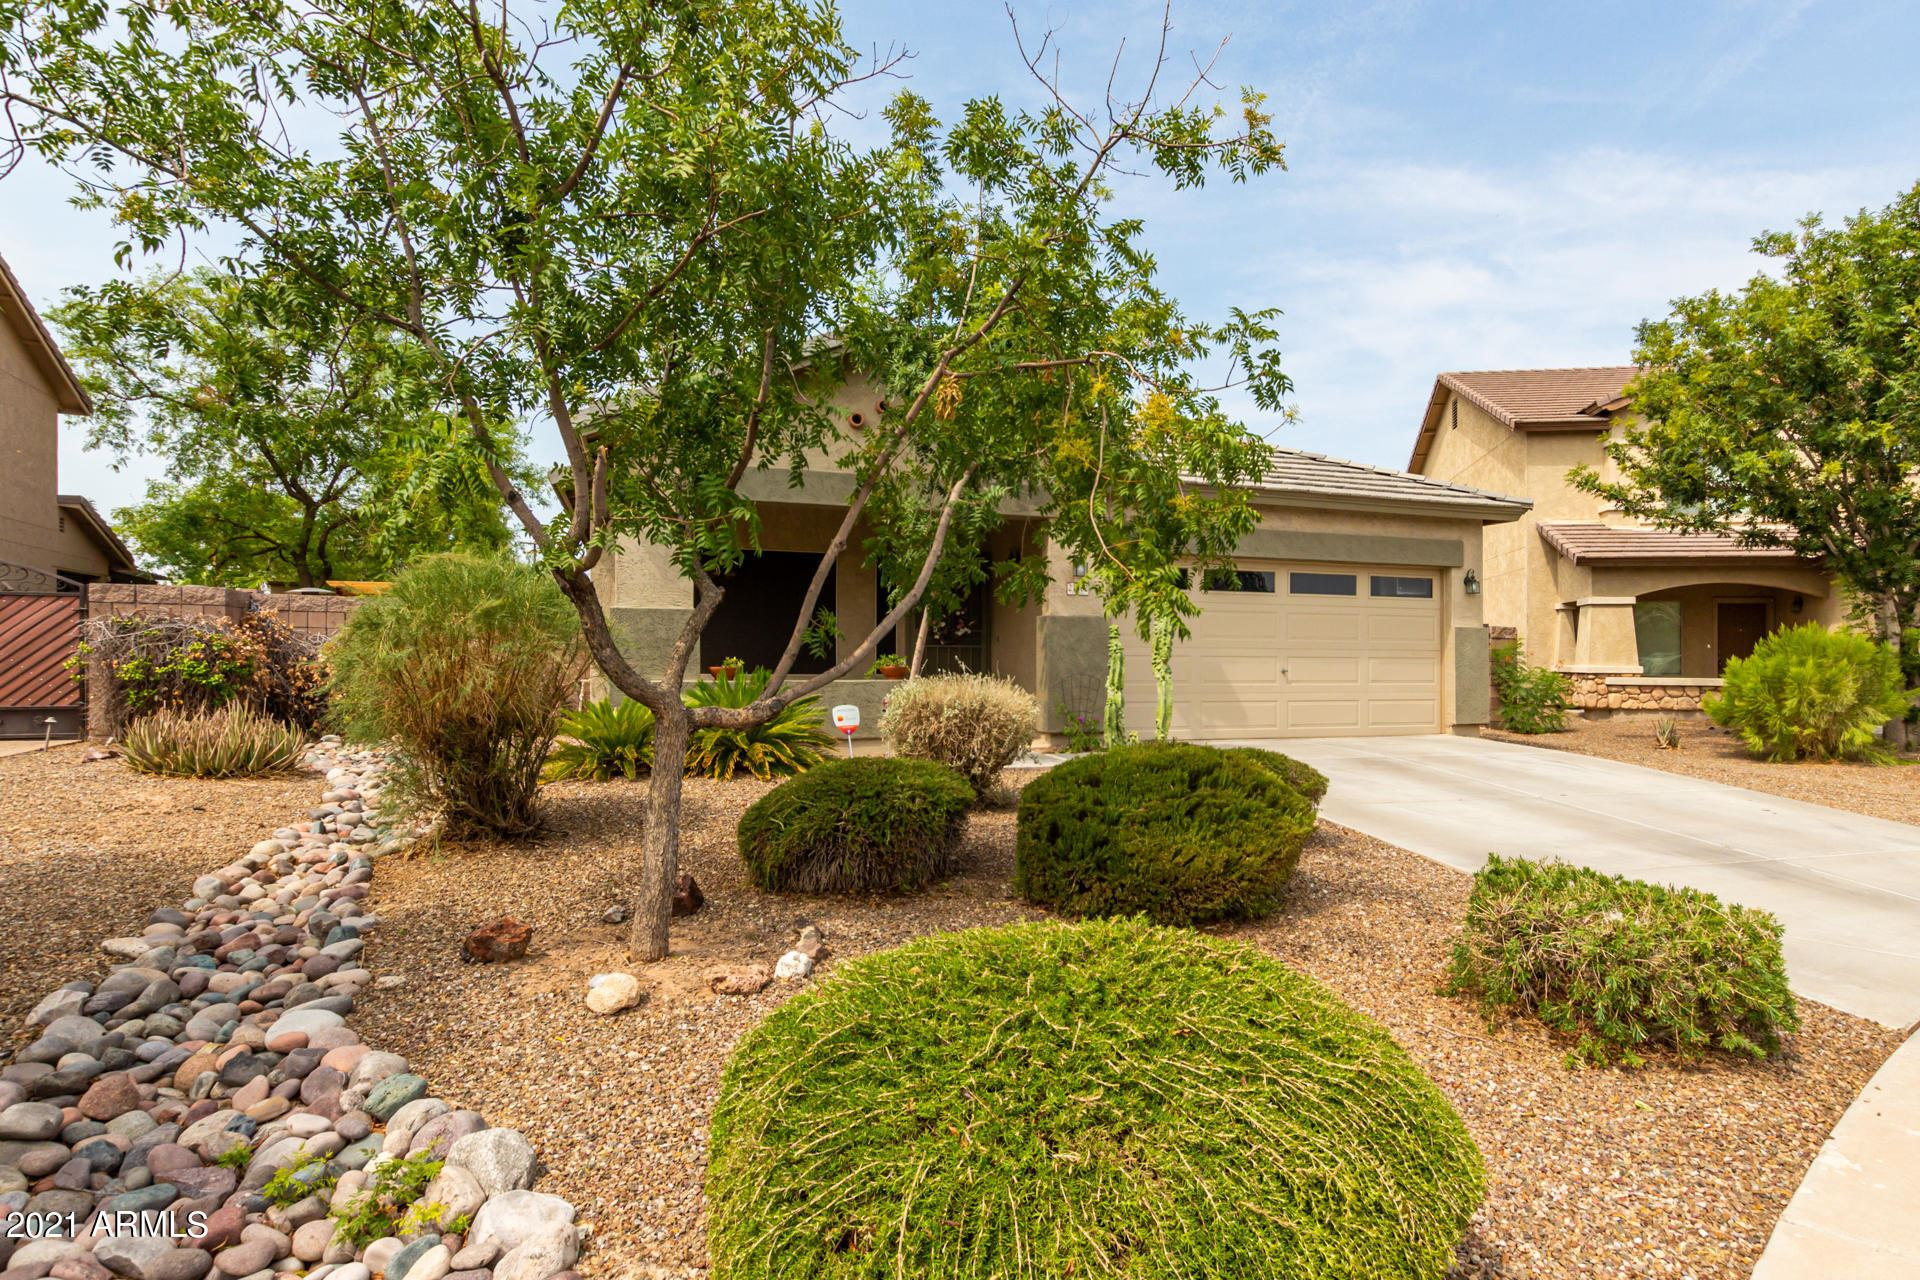 Photo of 21302 N SUNSET Drive, Maricopa, AZ 85139 (MLS # 6269095)